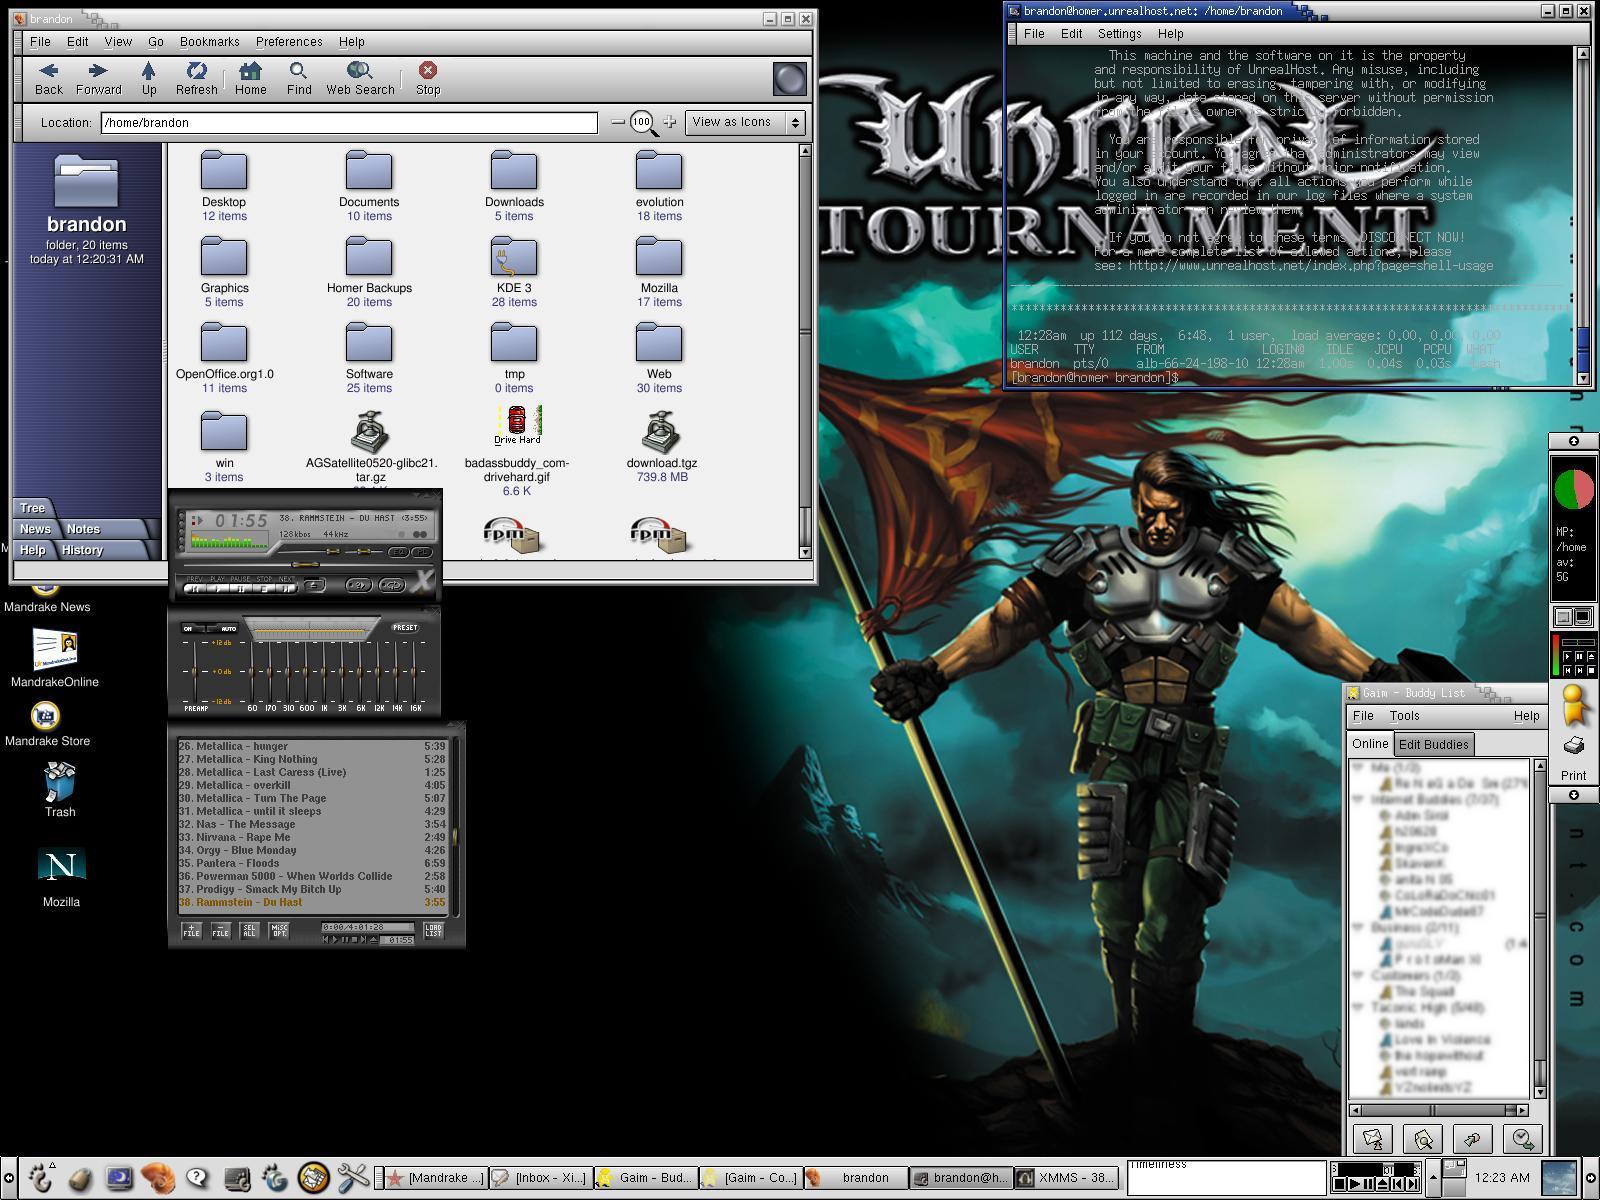 Linux Mandrake 8.2